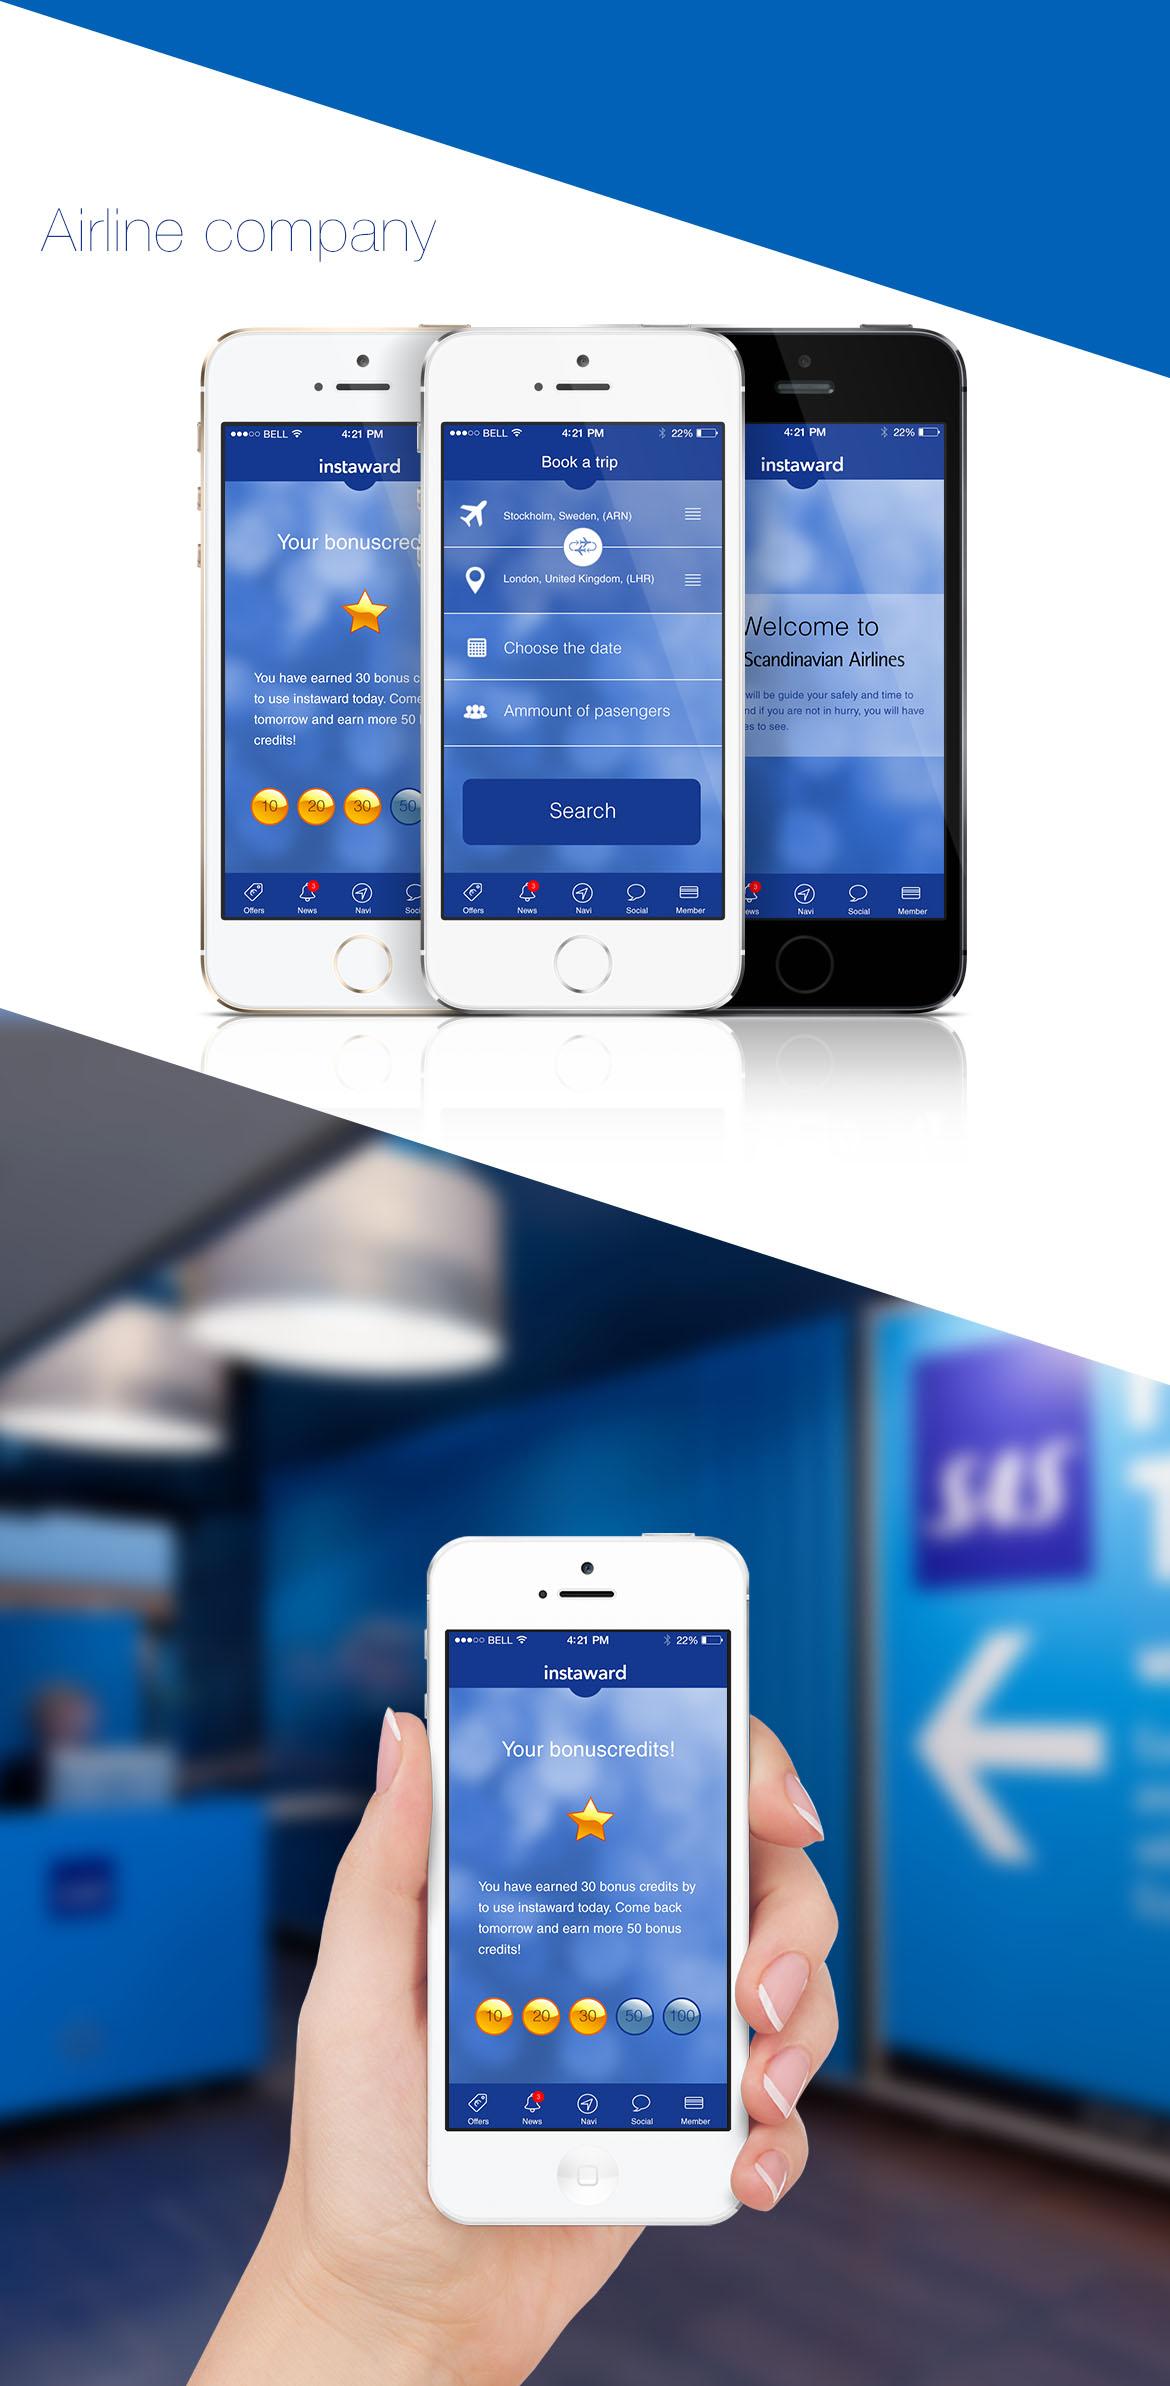 InstawardAirlineCompany long Airline companies, Instaward Communication Platform